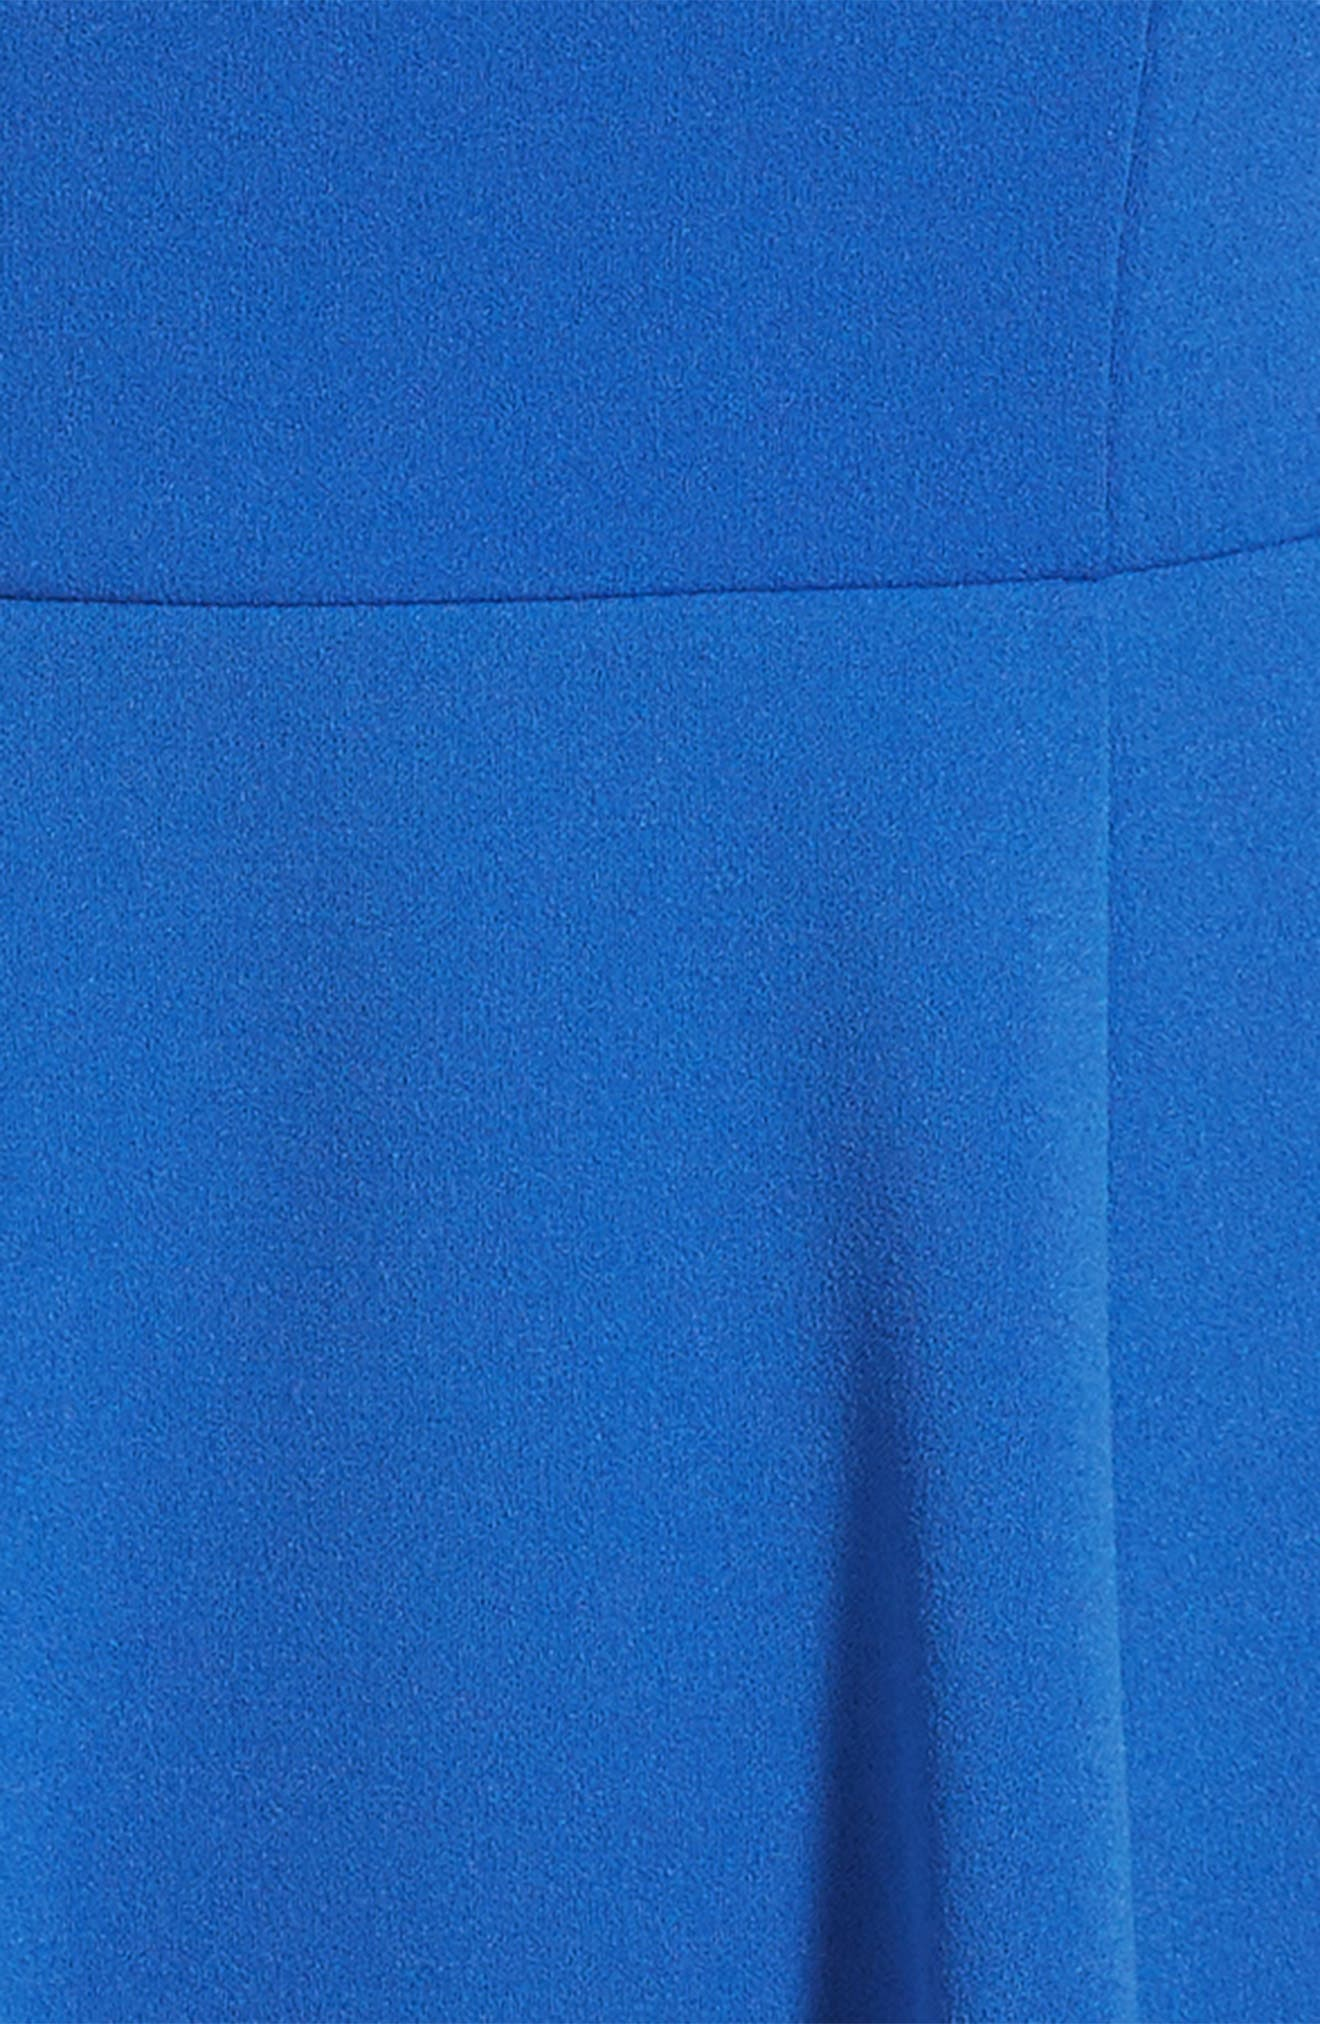 Off the Shoulder Ruffle Dress,                             Alternate thumbnail 3, color,                             Royal Blue